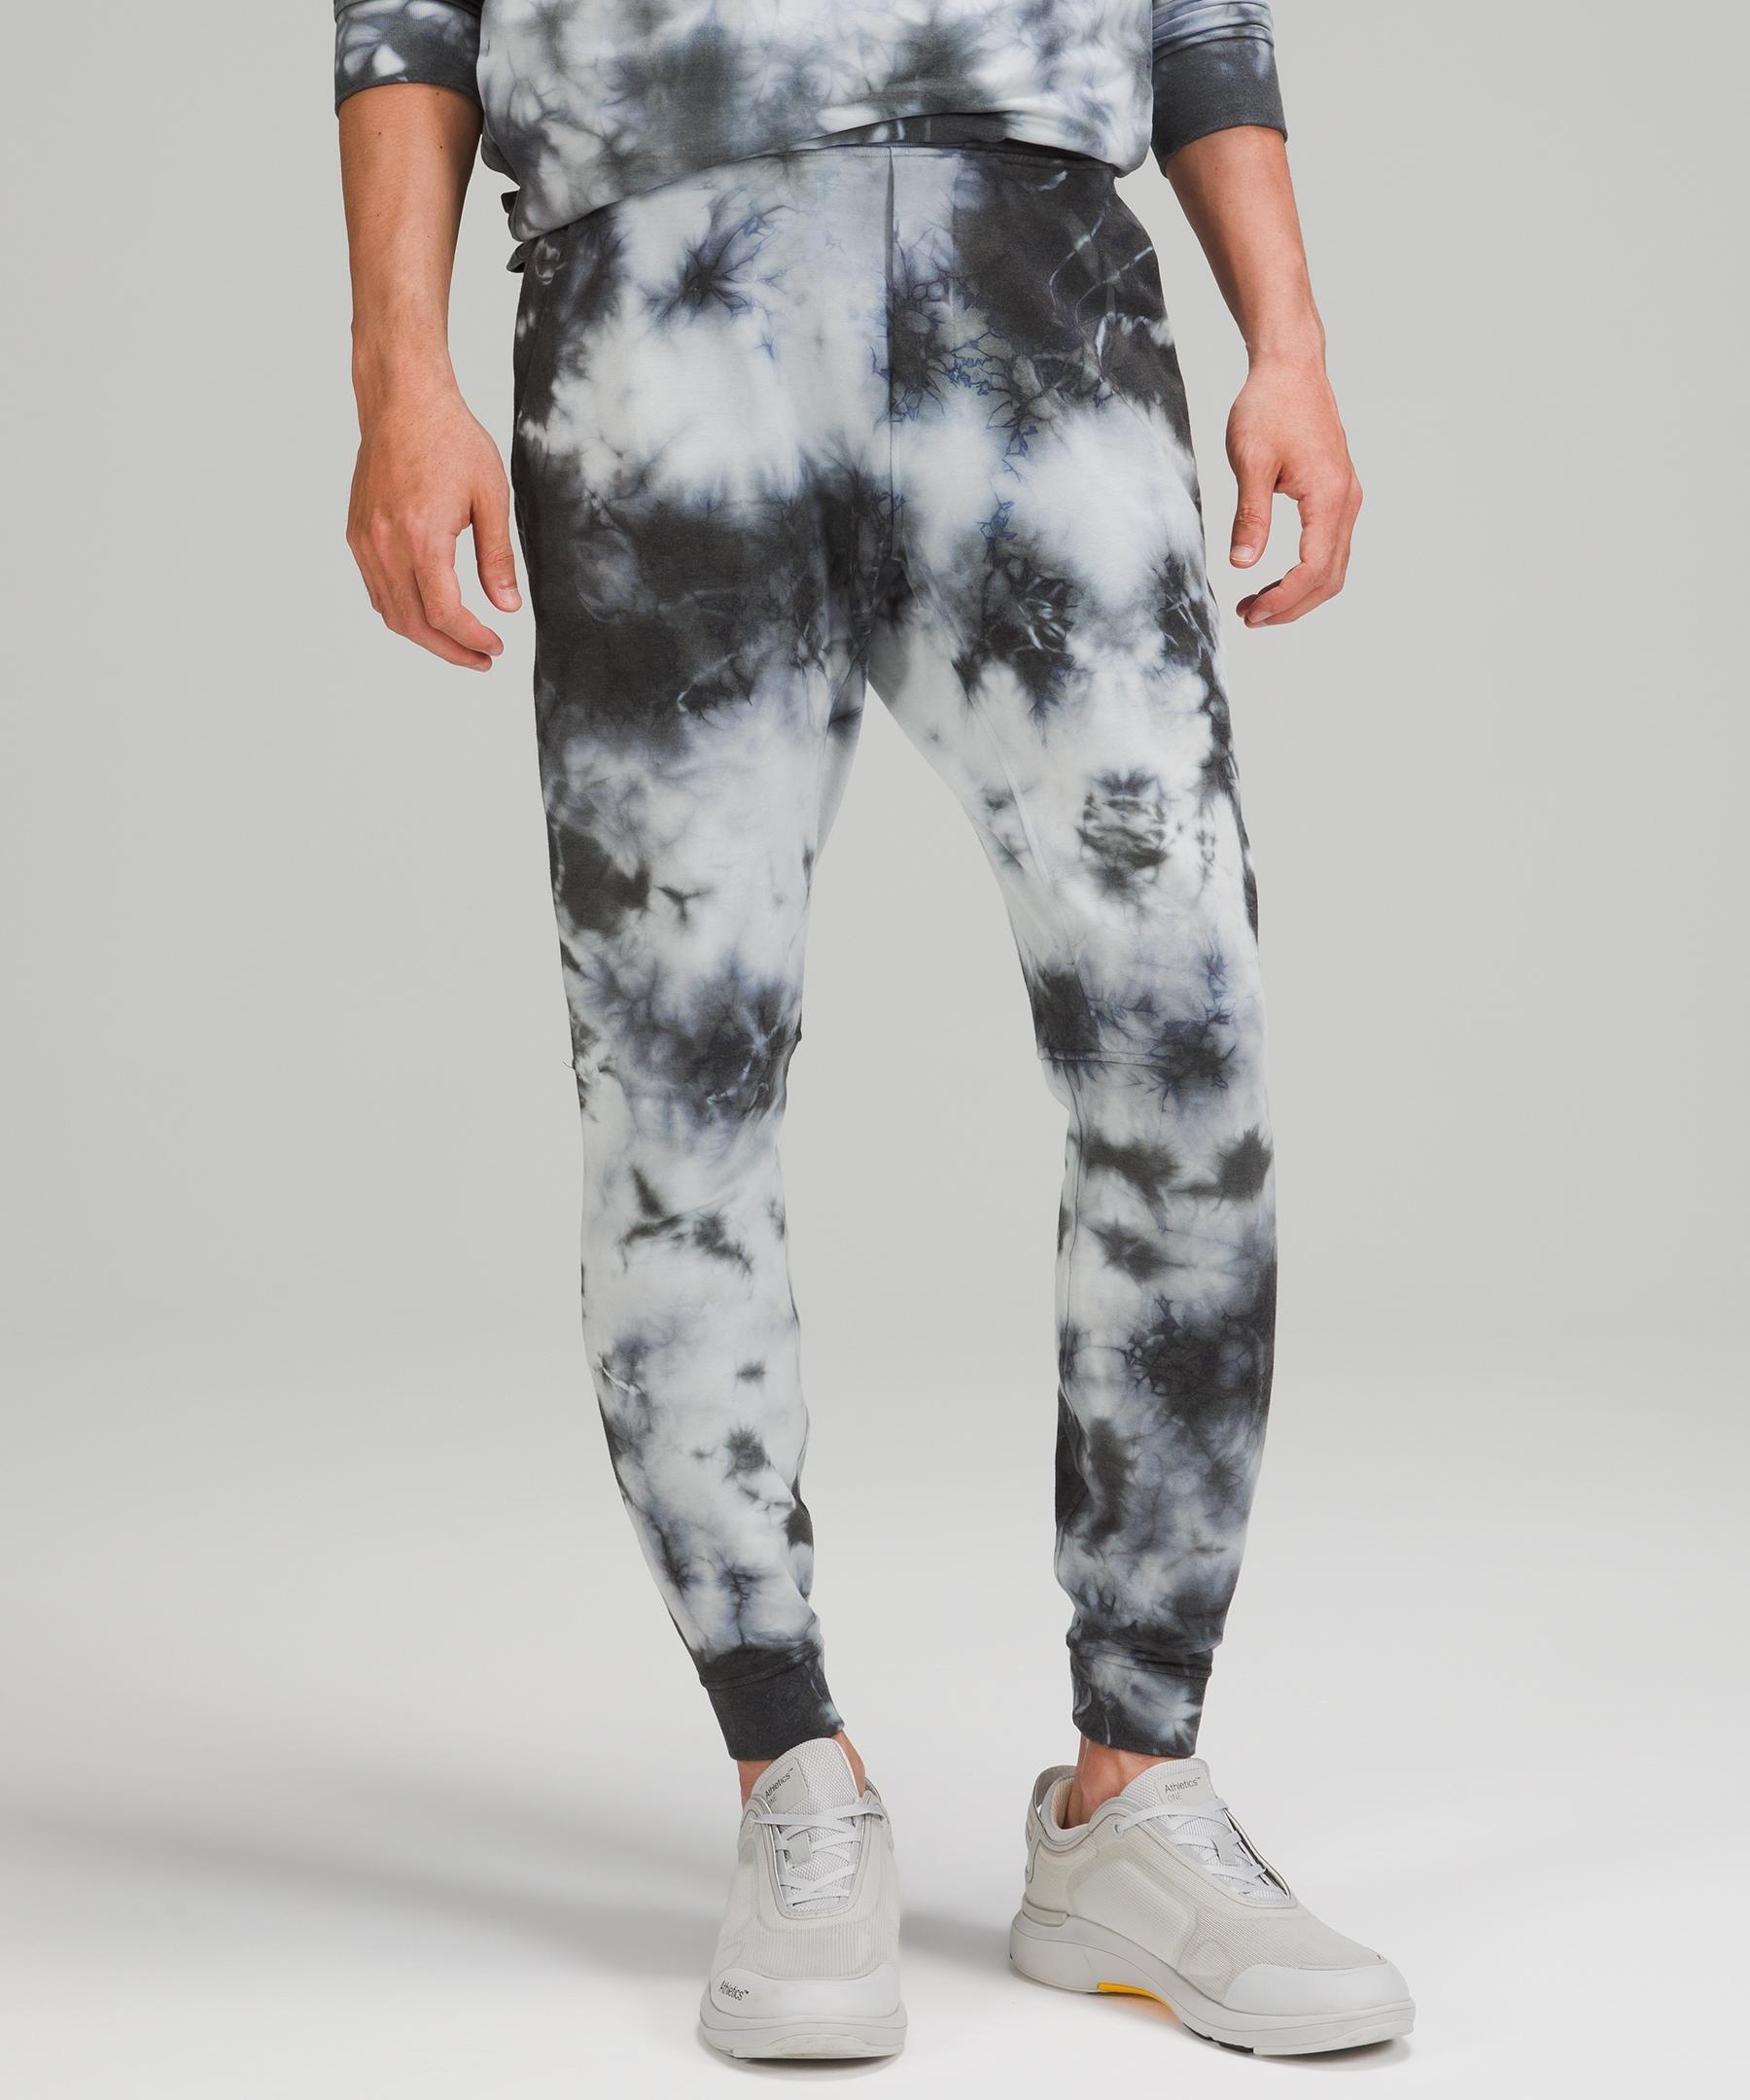 Lululemon jogger bottoms